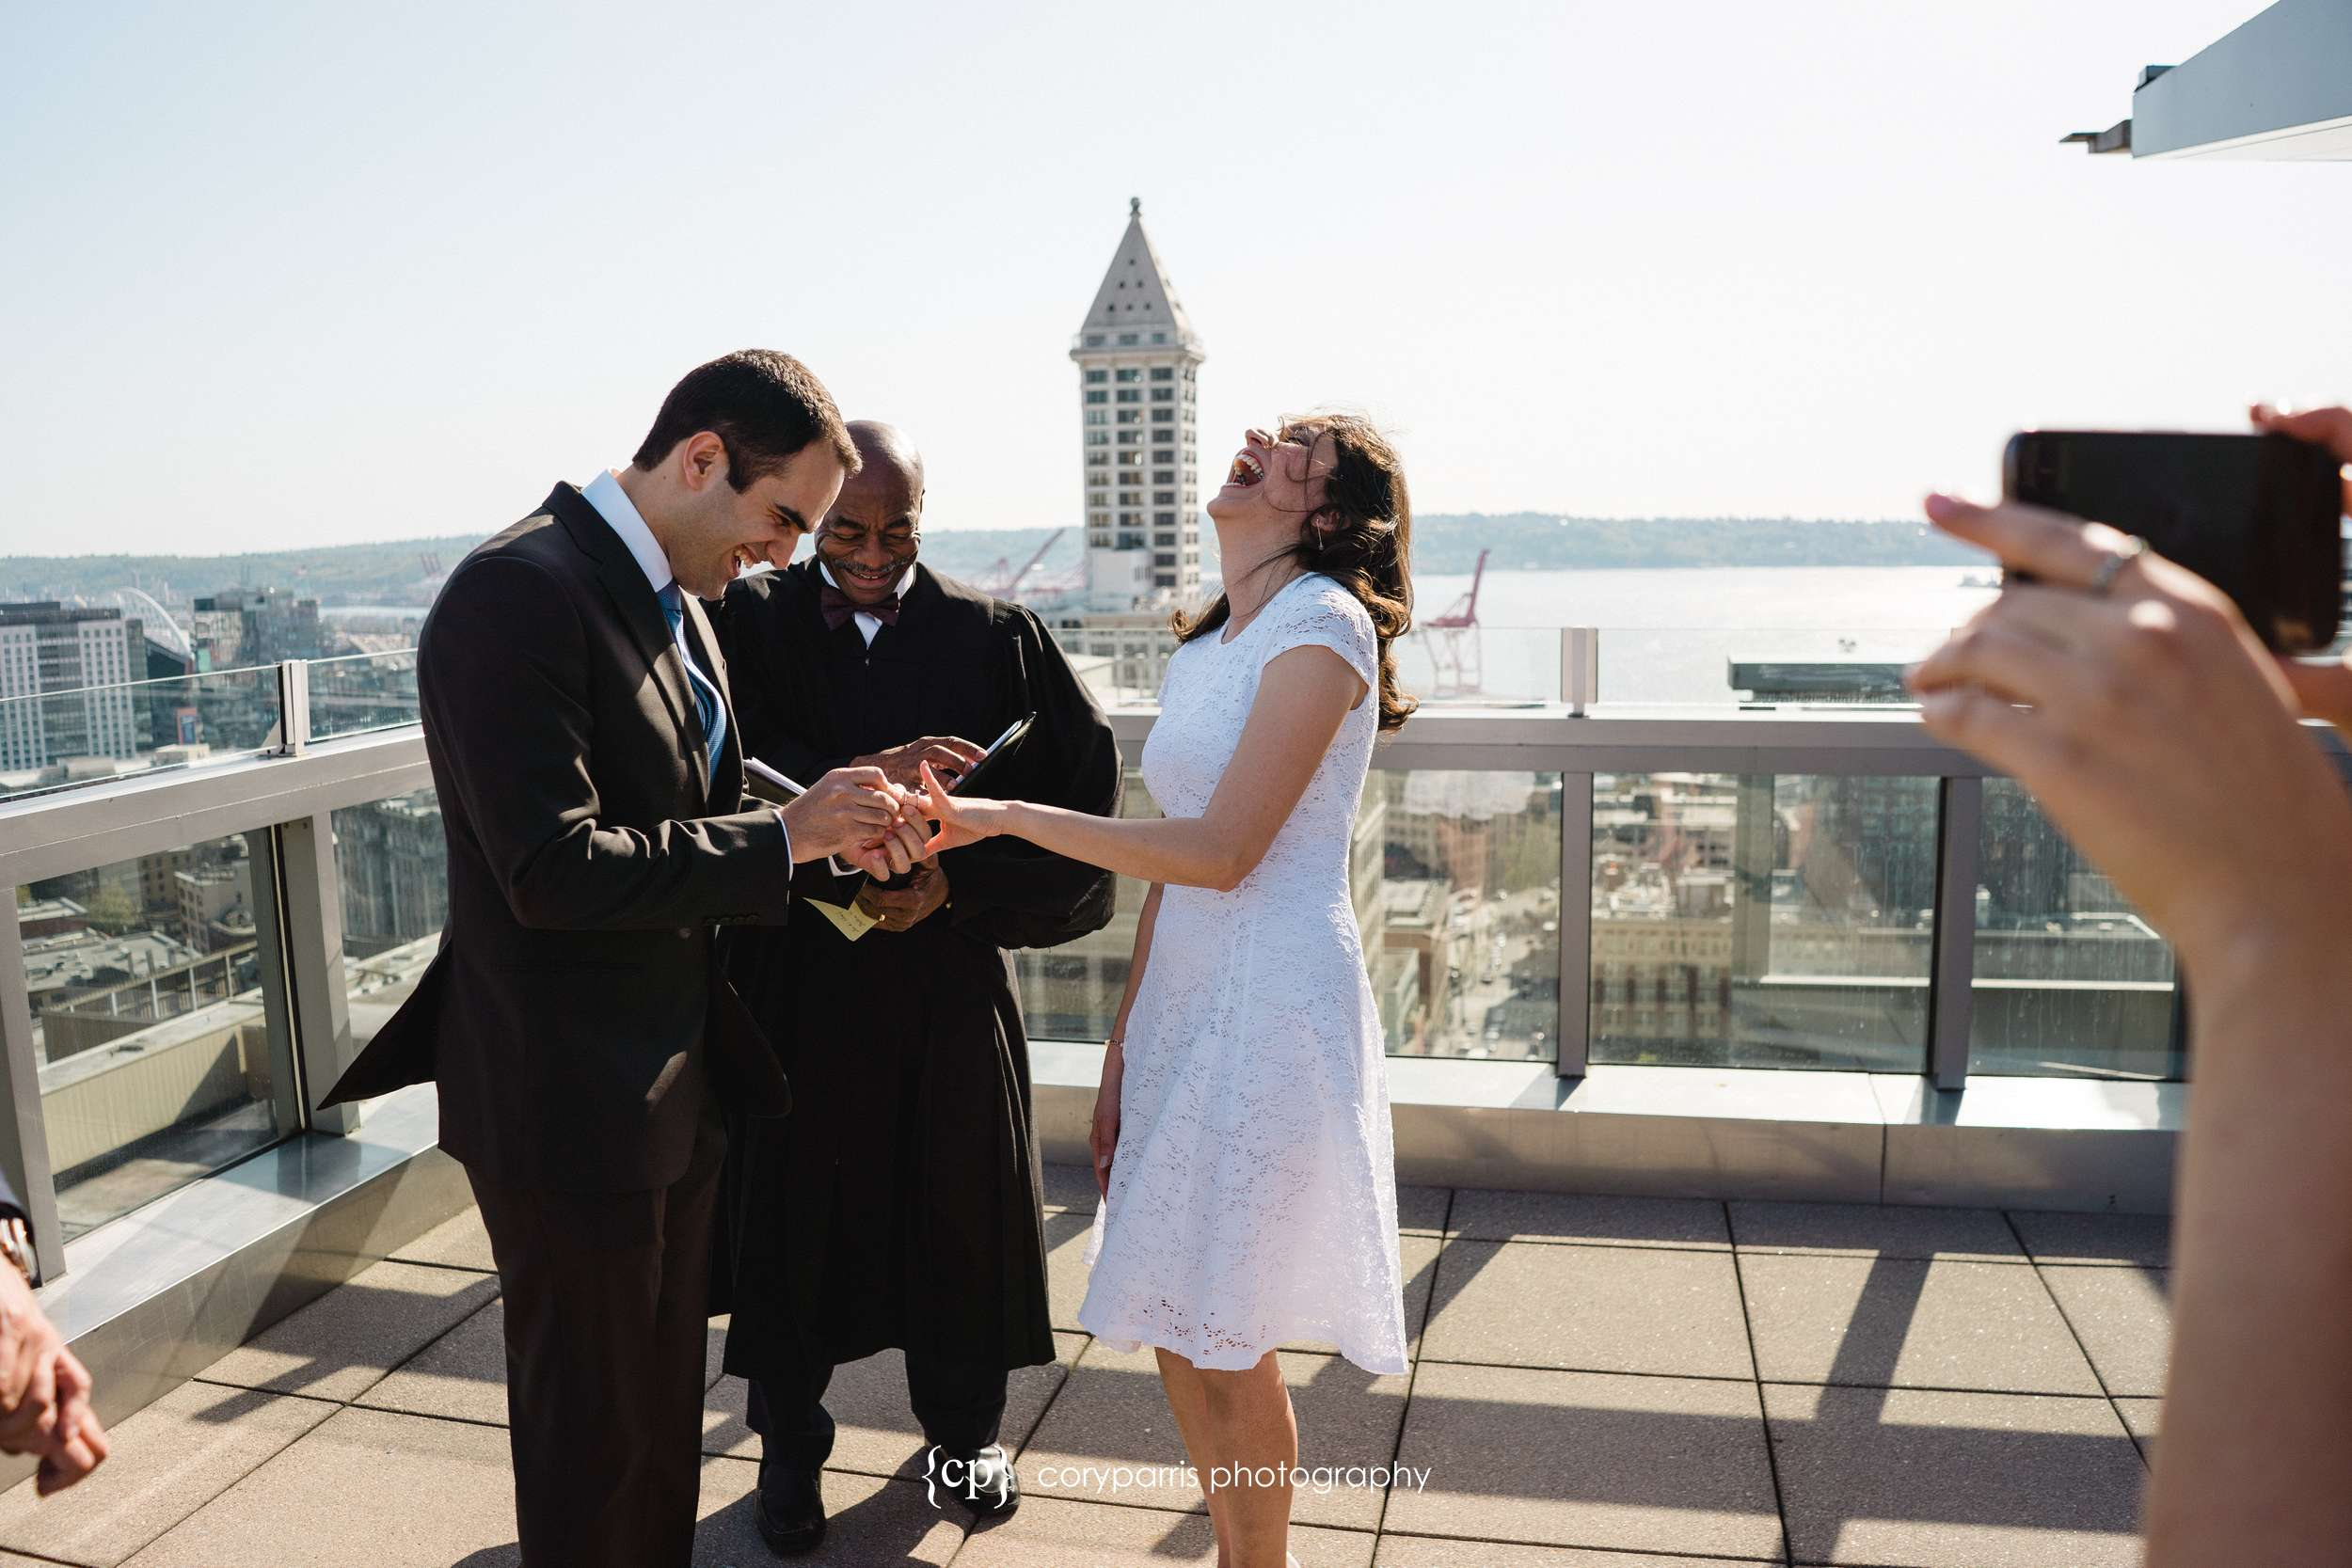 056-Seattle-Courthouse-Wedding.jpg